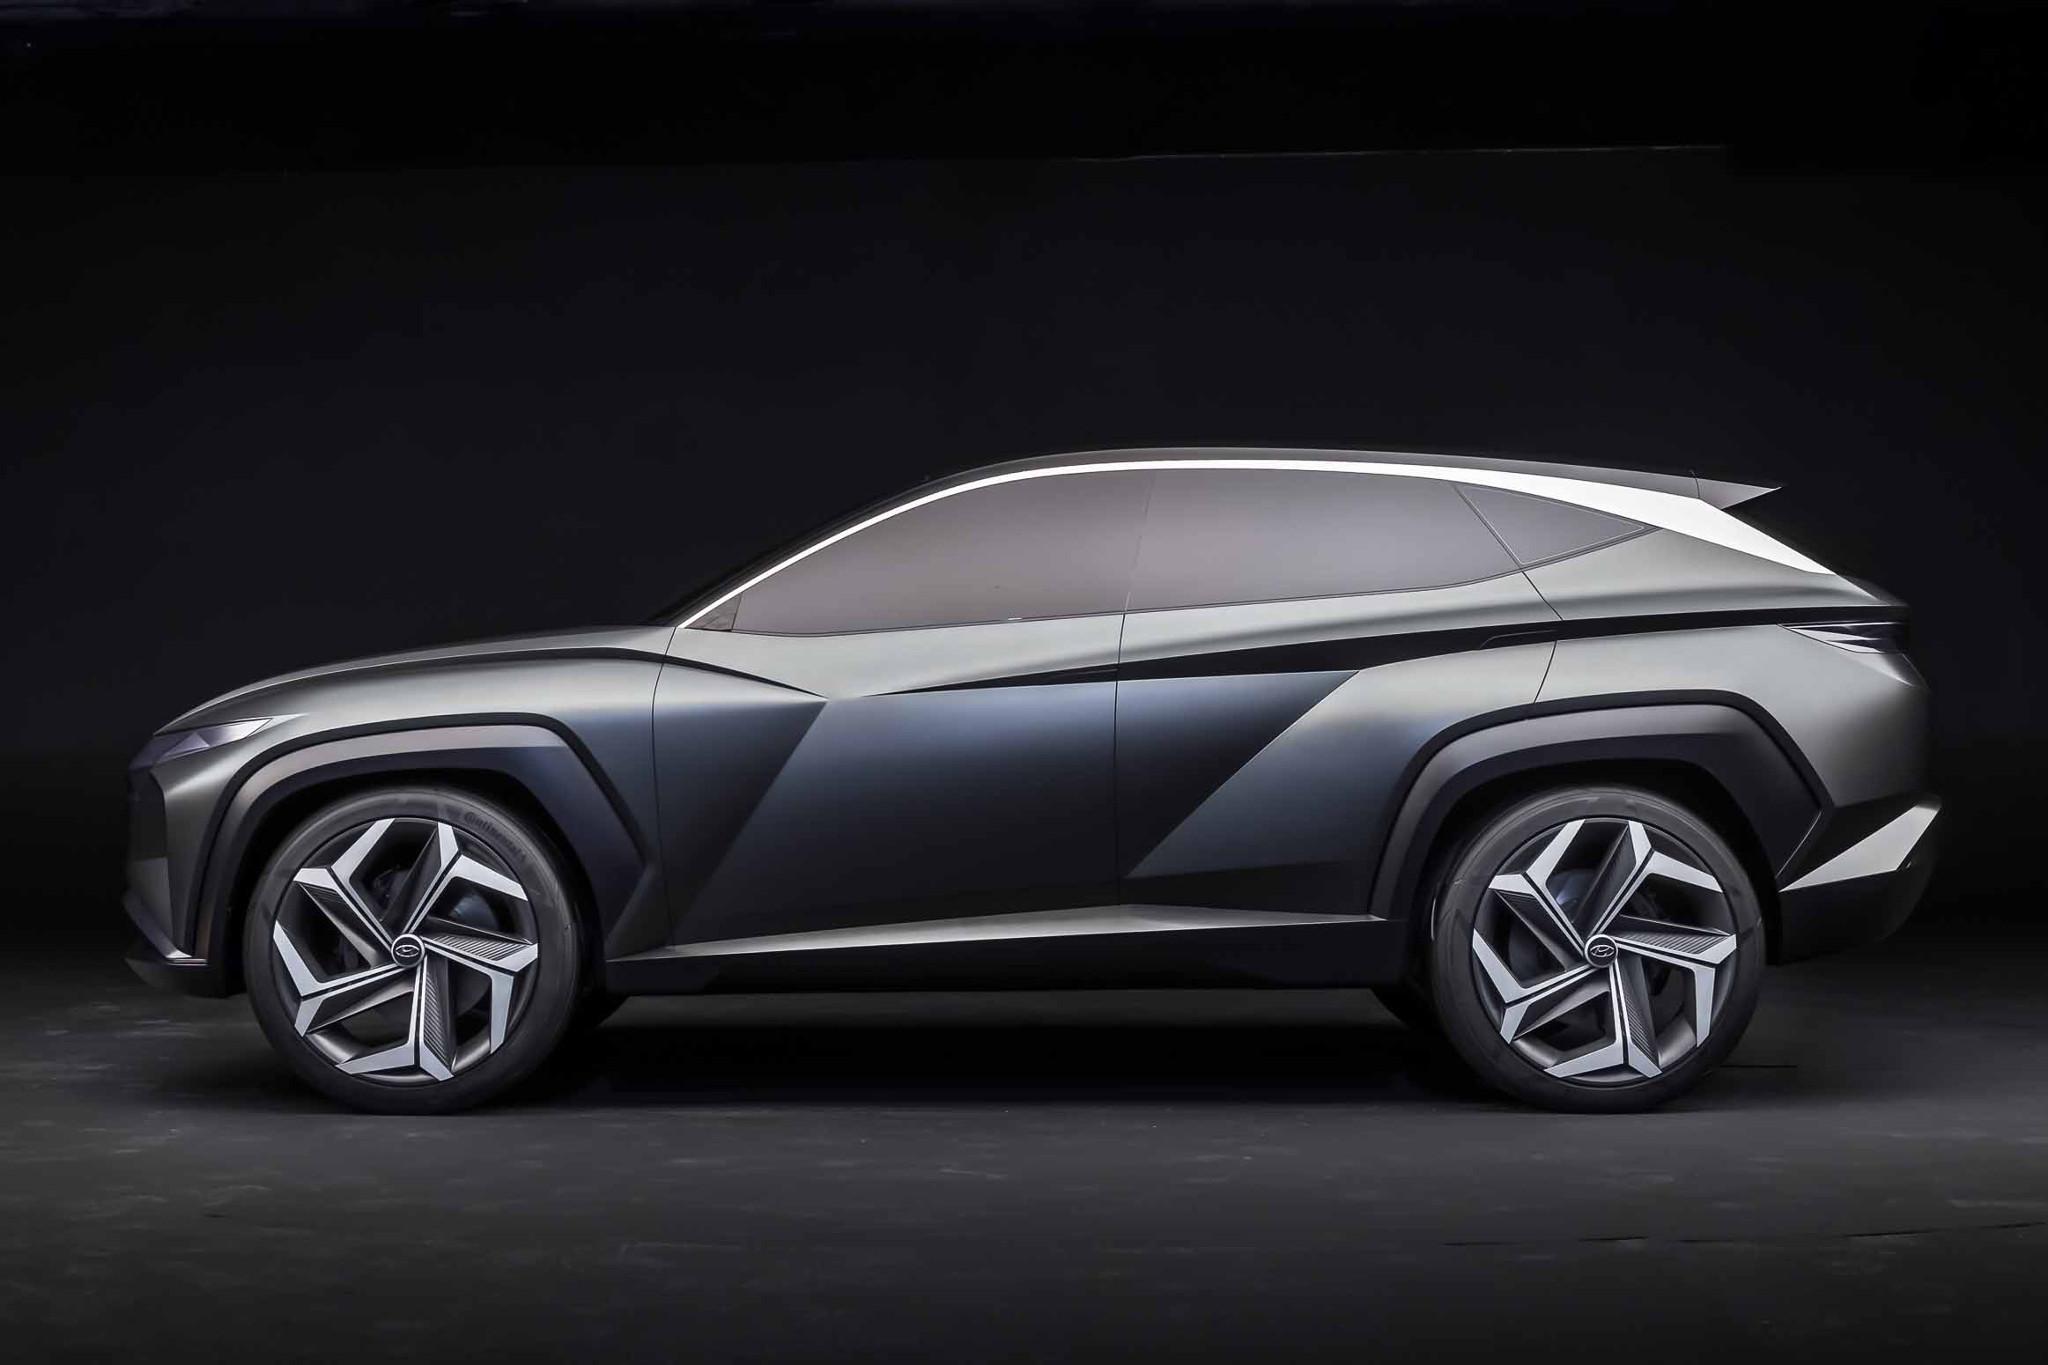 hyundai-vision-t-concept-03-exterior--profile--silver.jpg